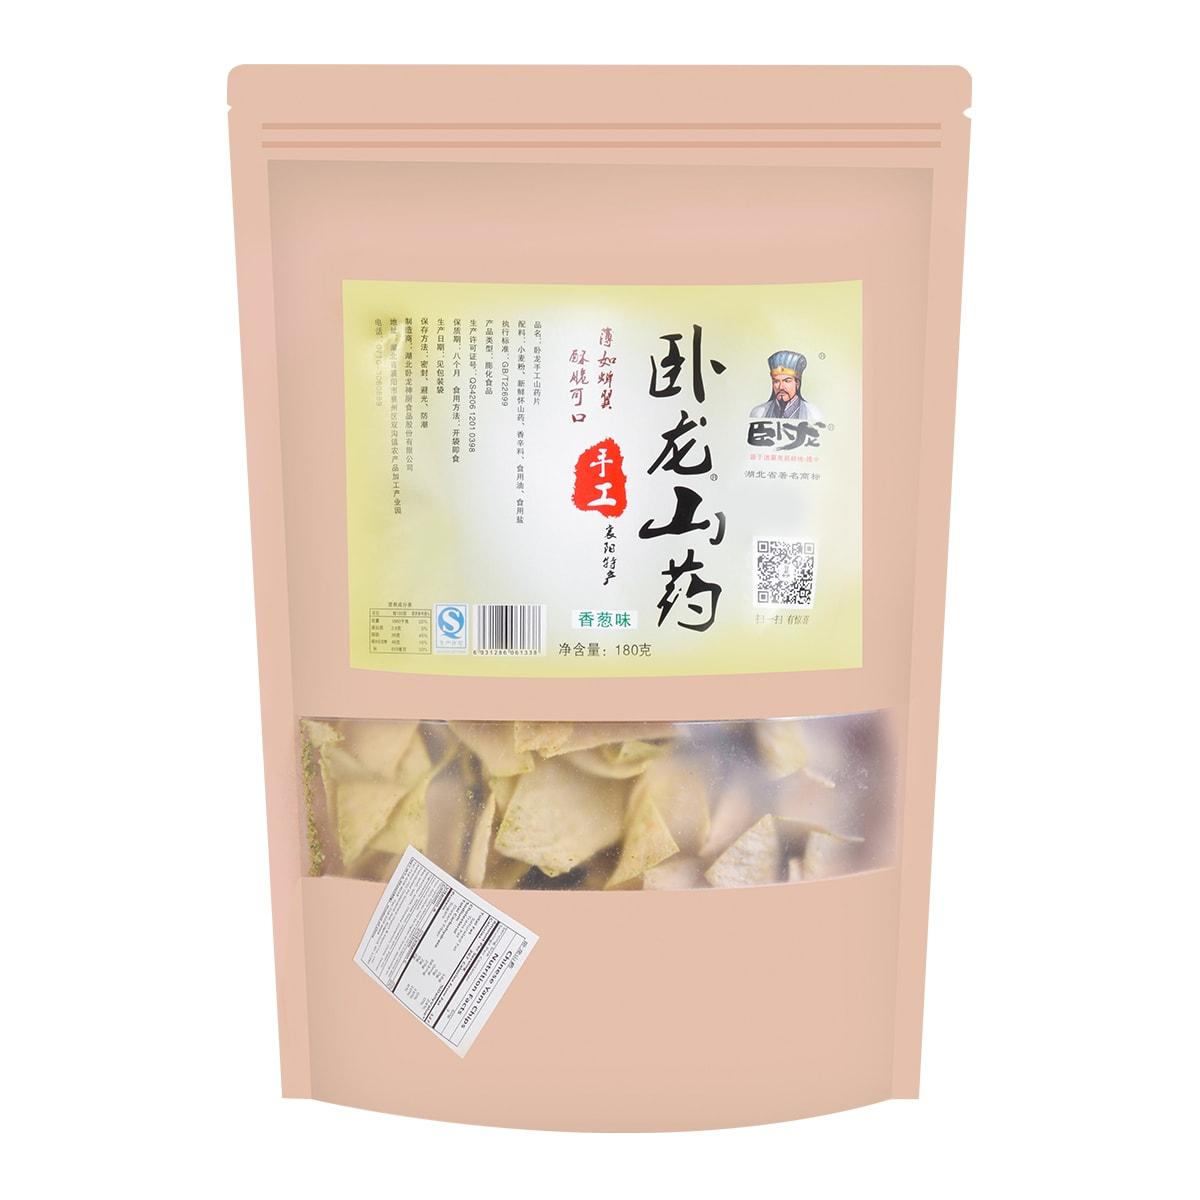 WOLONG Chinese Yam Chips Scallion Flavor 180g